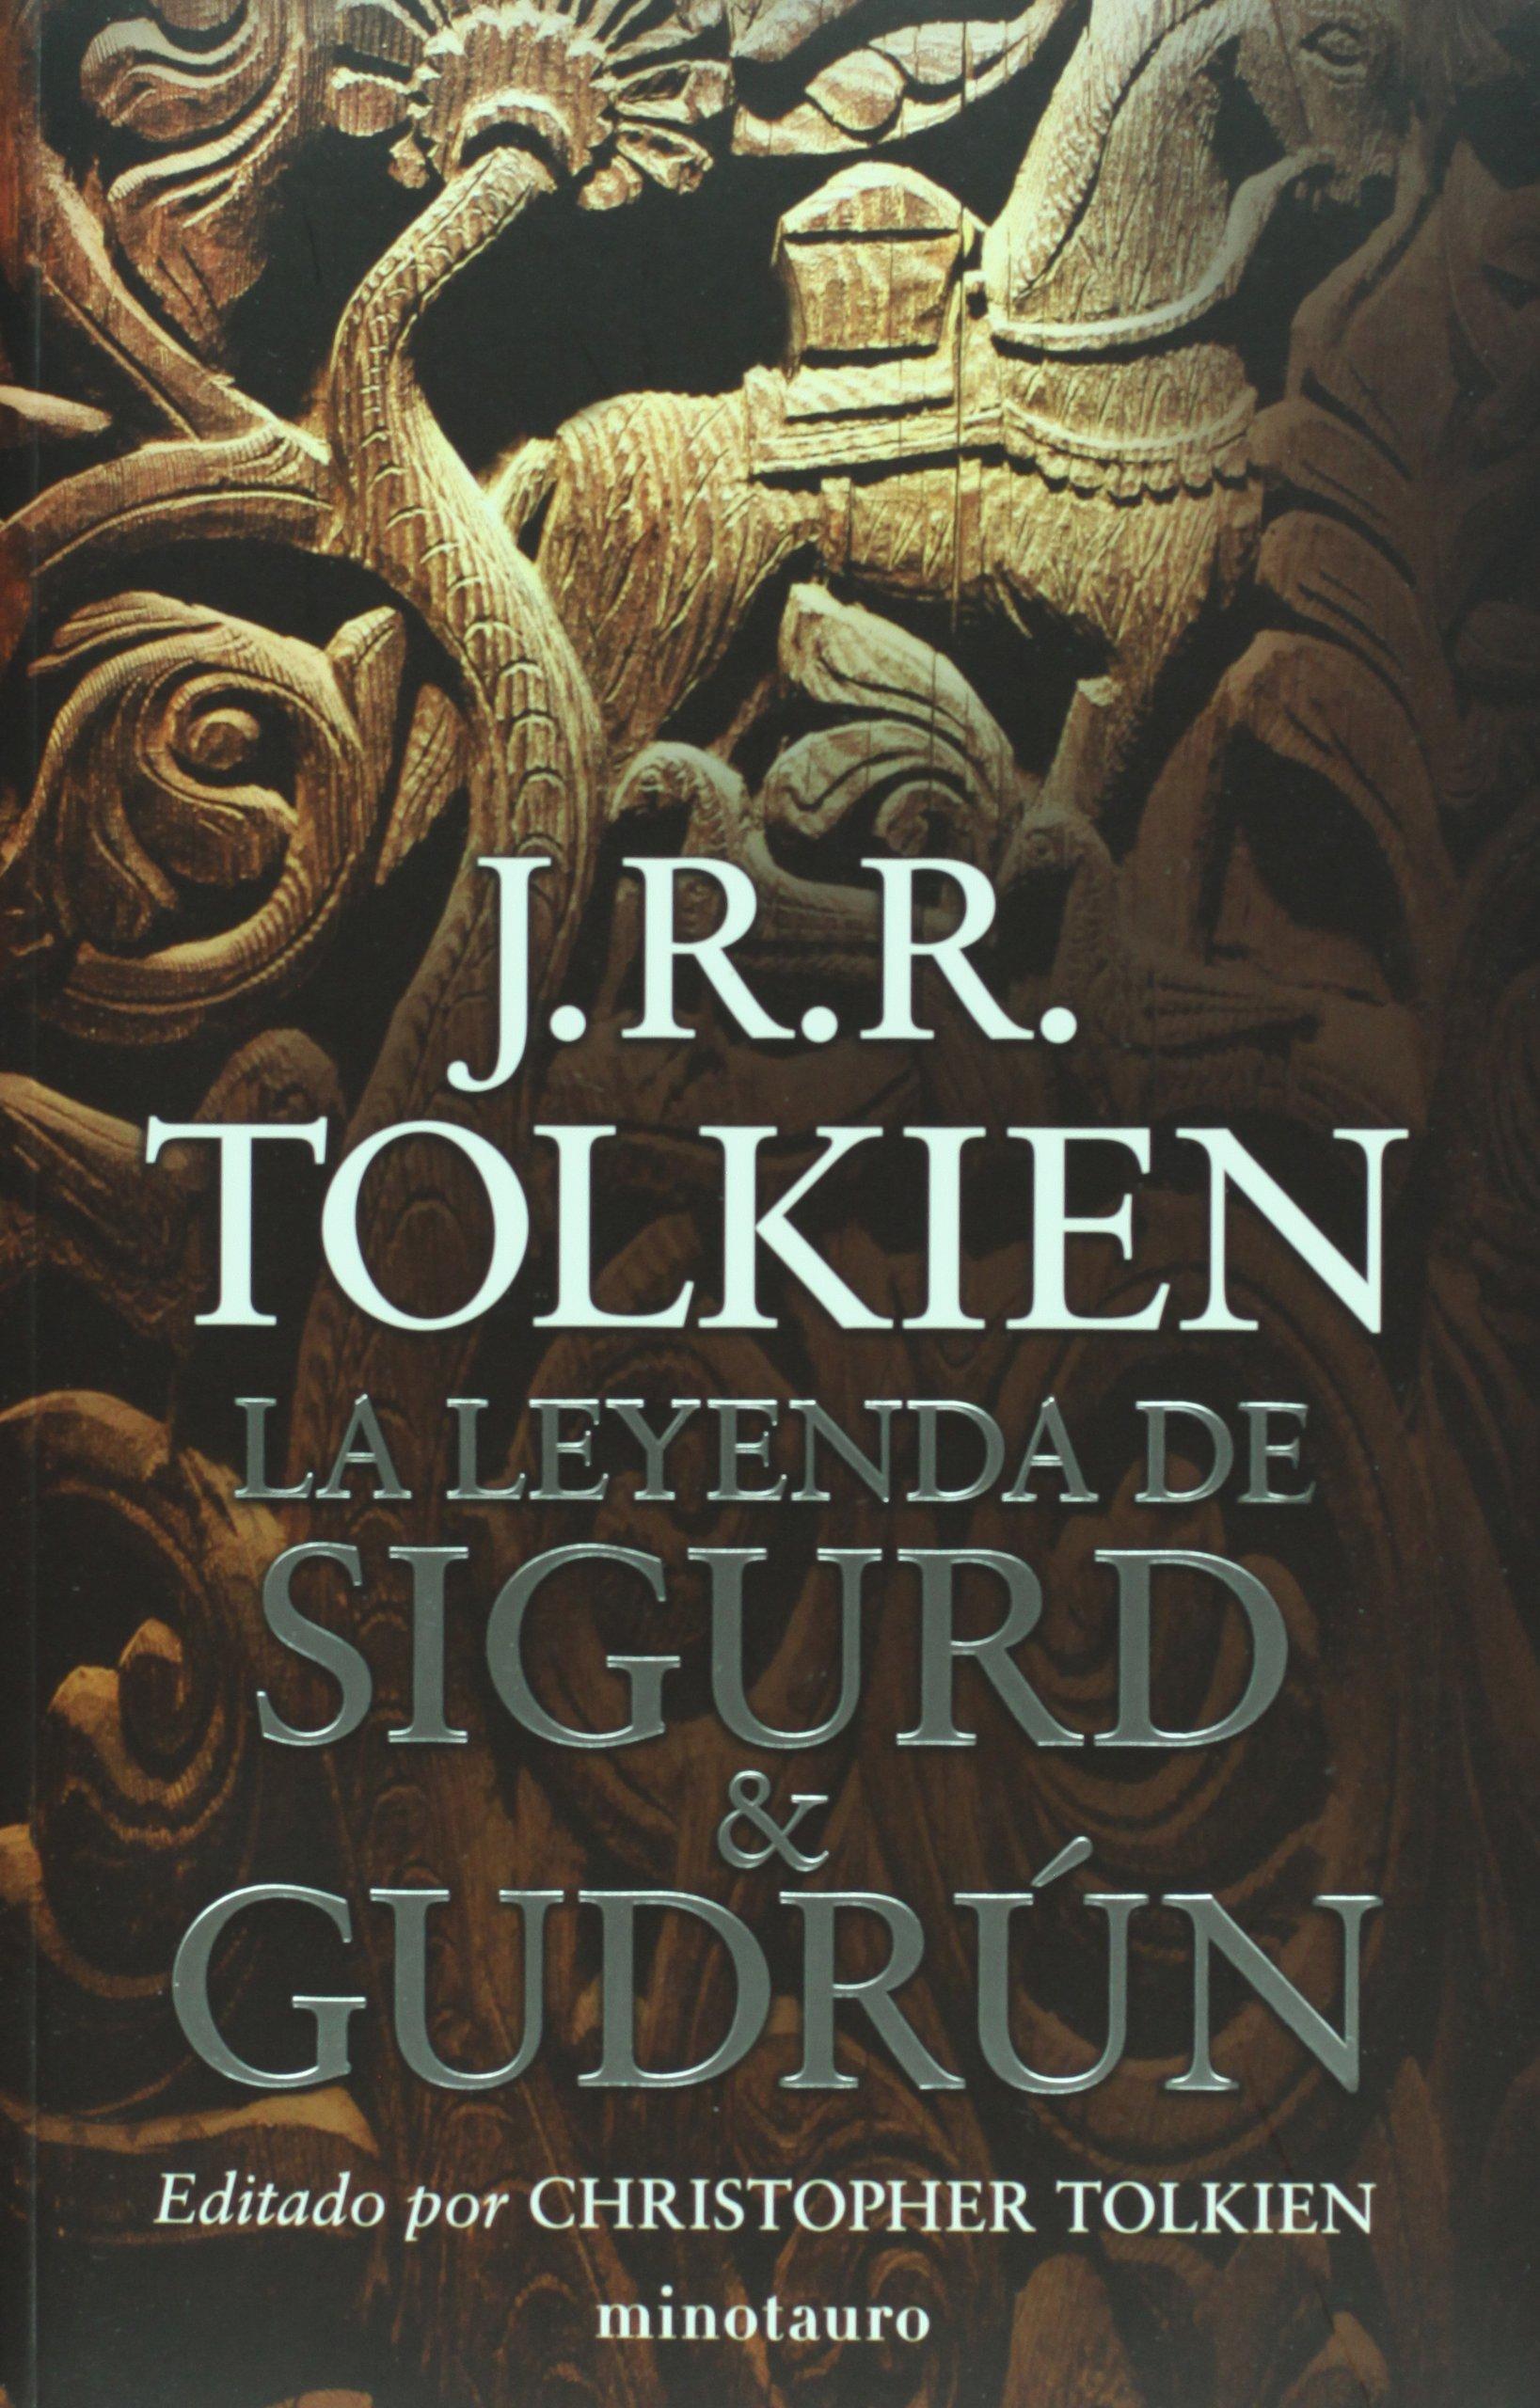 LA LEYENDA DE SIGURD & GUDRUN (Spanish Edition): J. R. R. Tolkien: 9786070702570: Amazon.com: Books